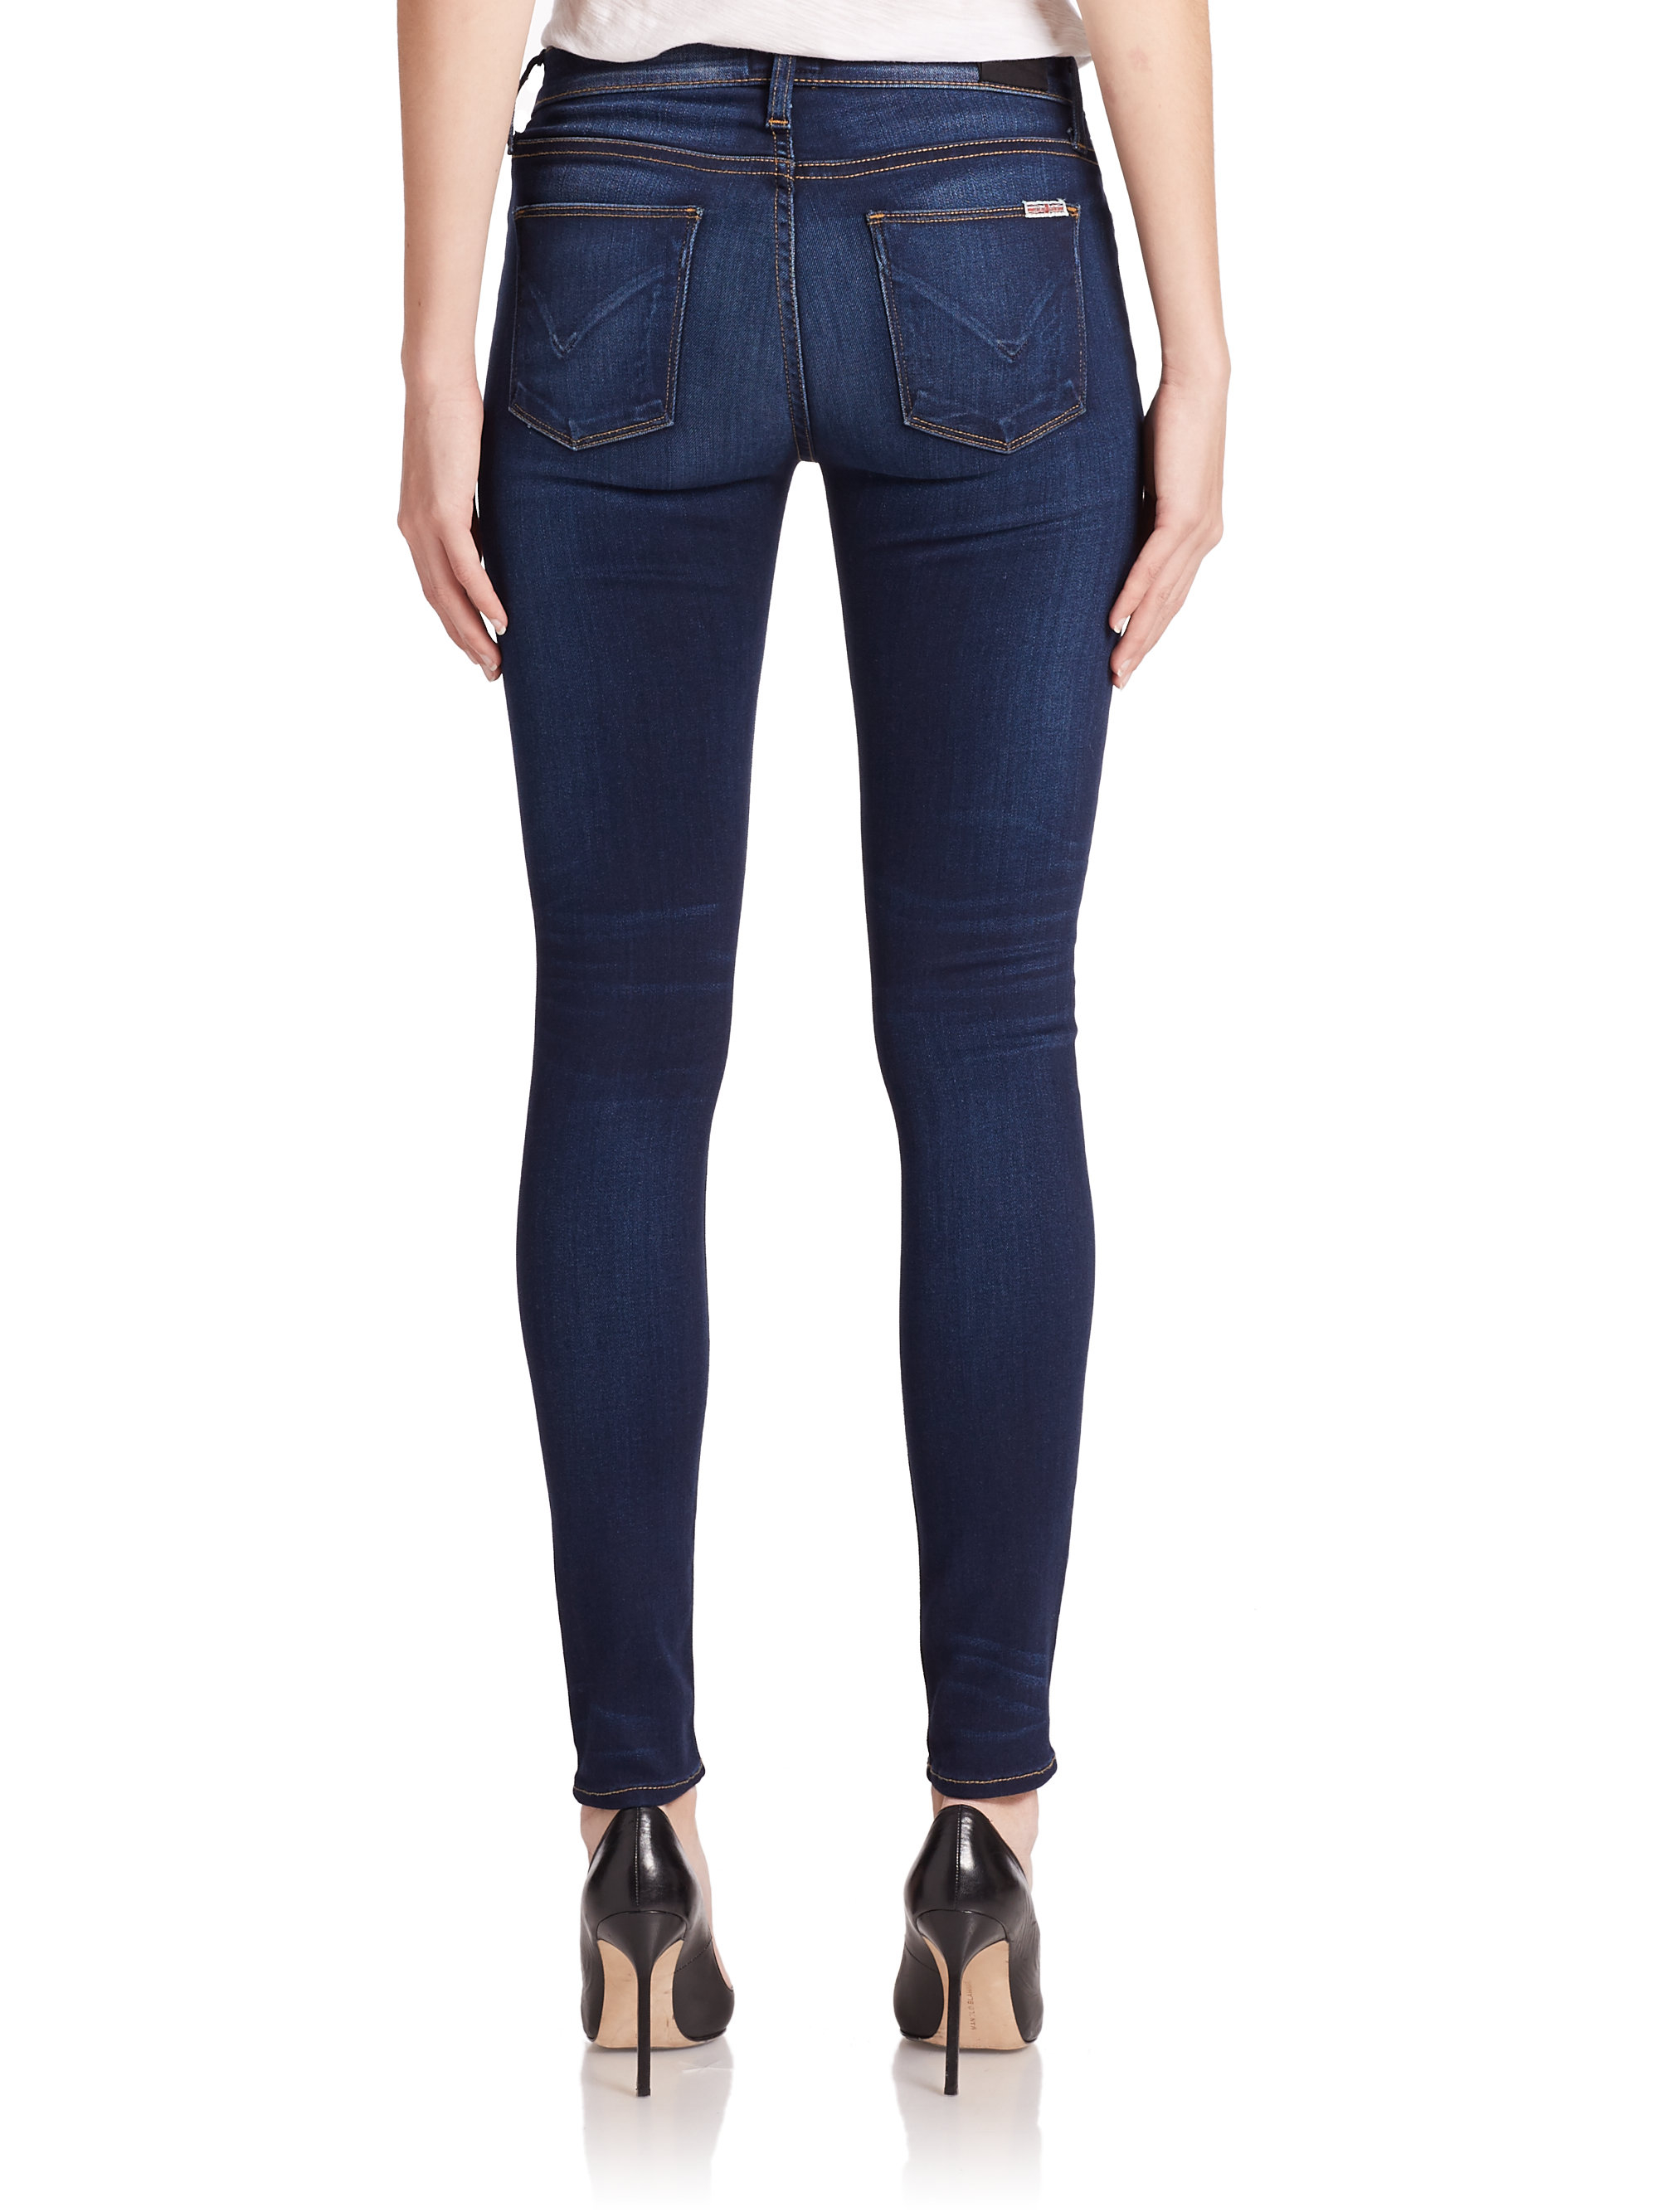 e79955c1dd6 Hudson Jeans Elysian Nico Mid-rise Super Skinny Jeans in Blue - Lyst